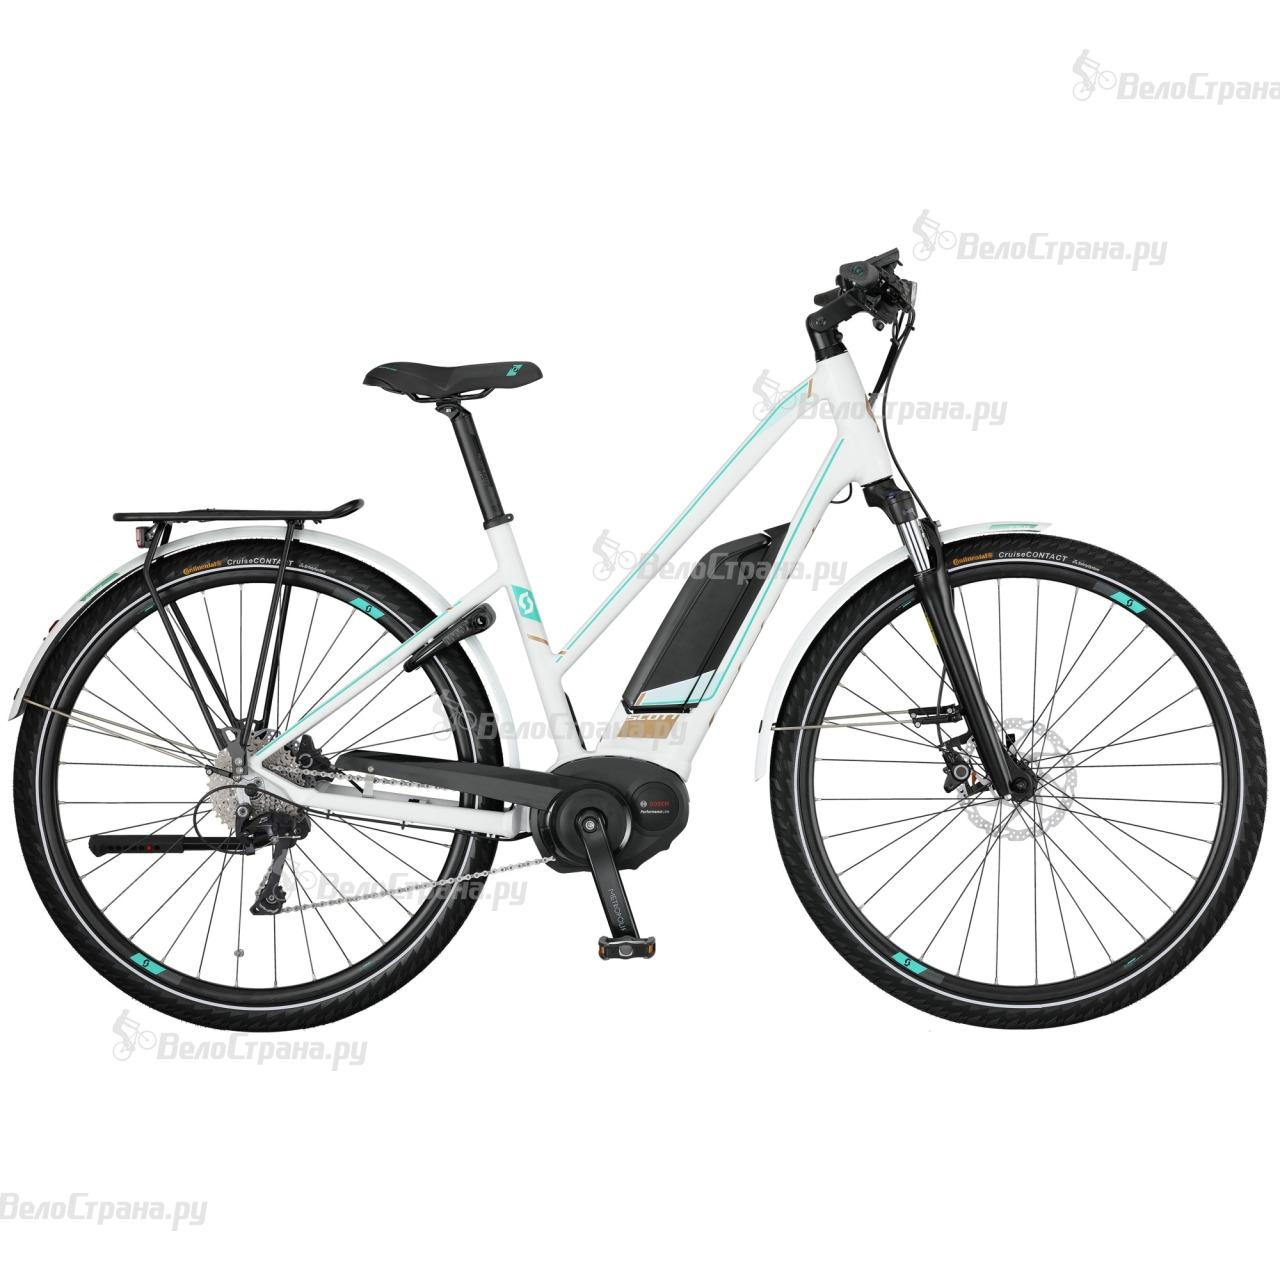 Велосипед Scott Sub Sport 20 Lady (2017)